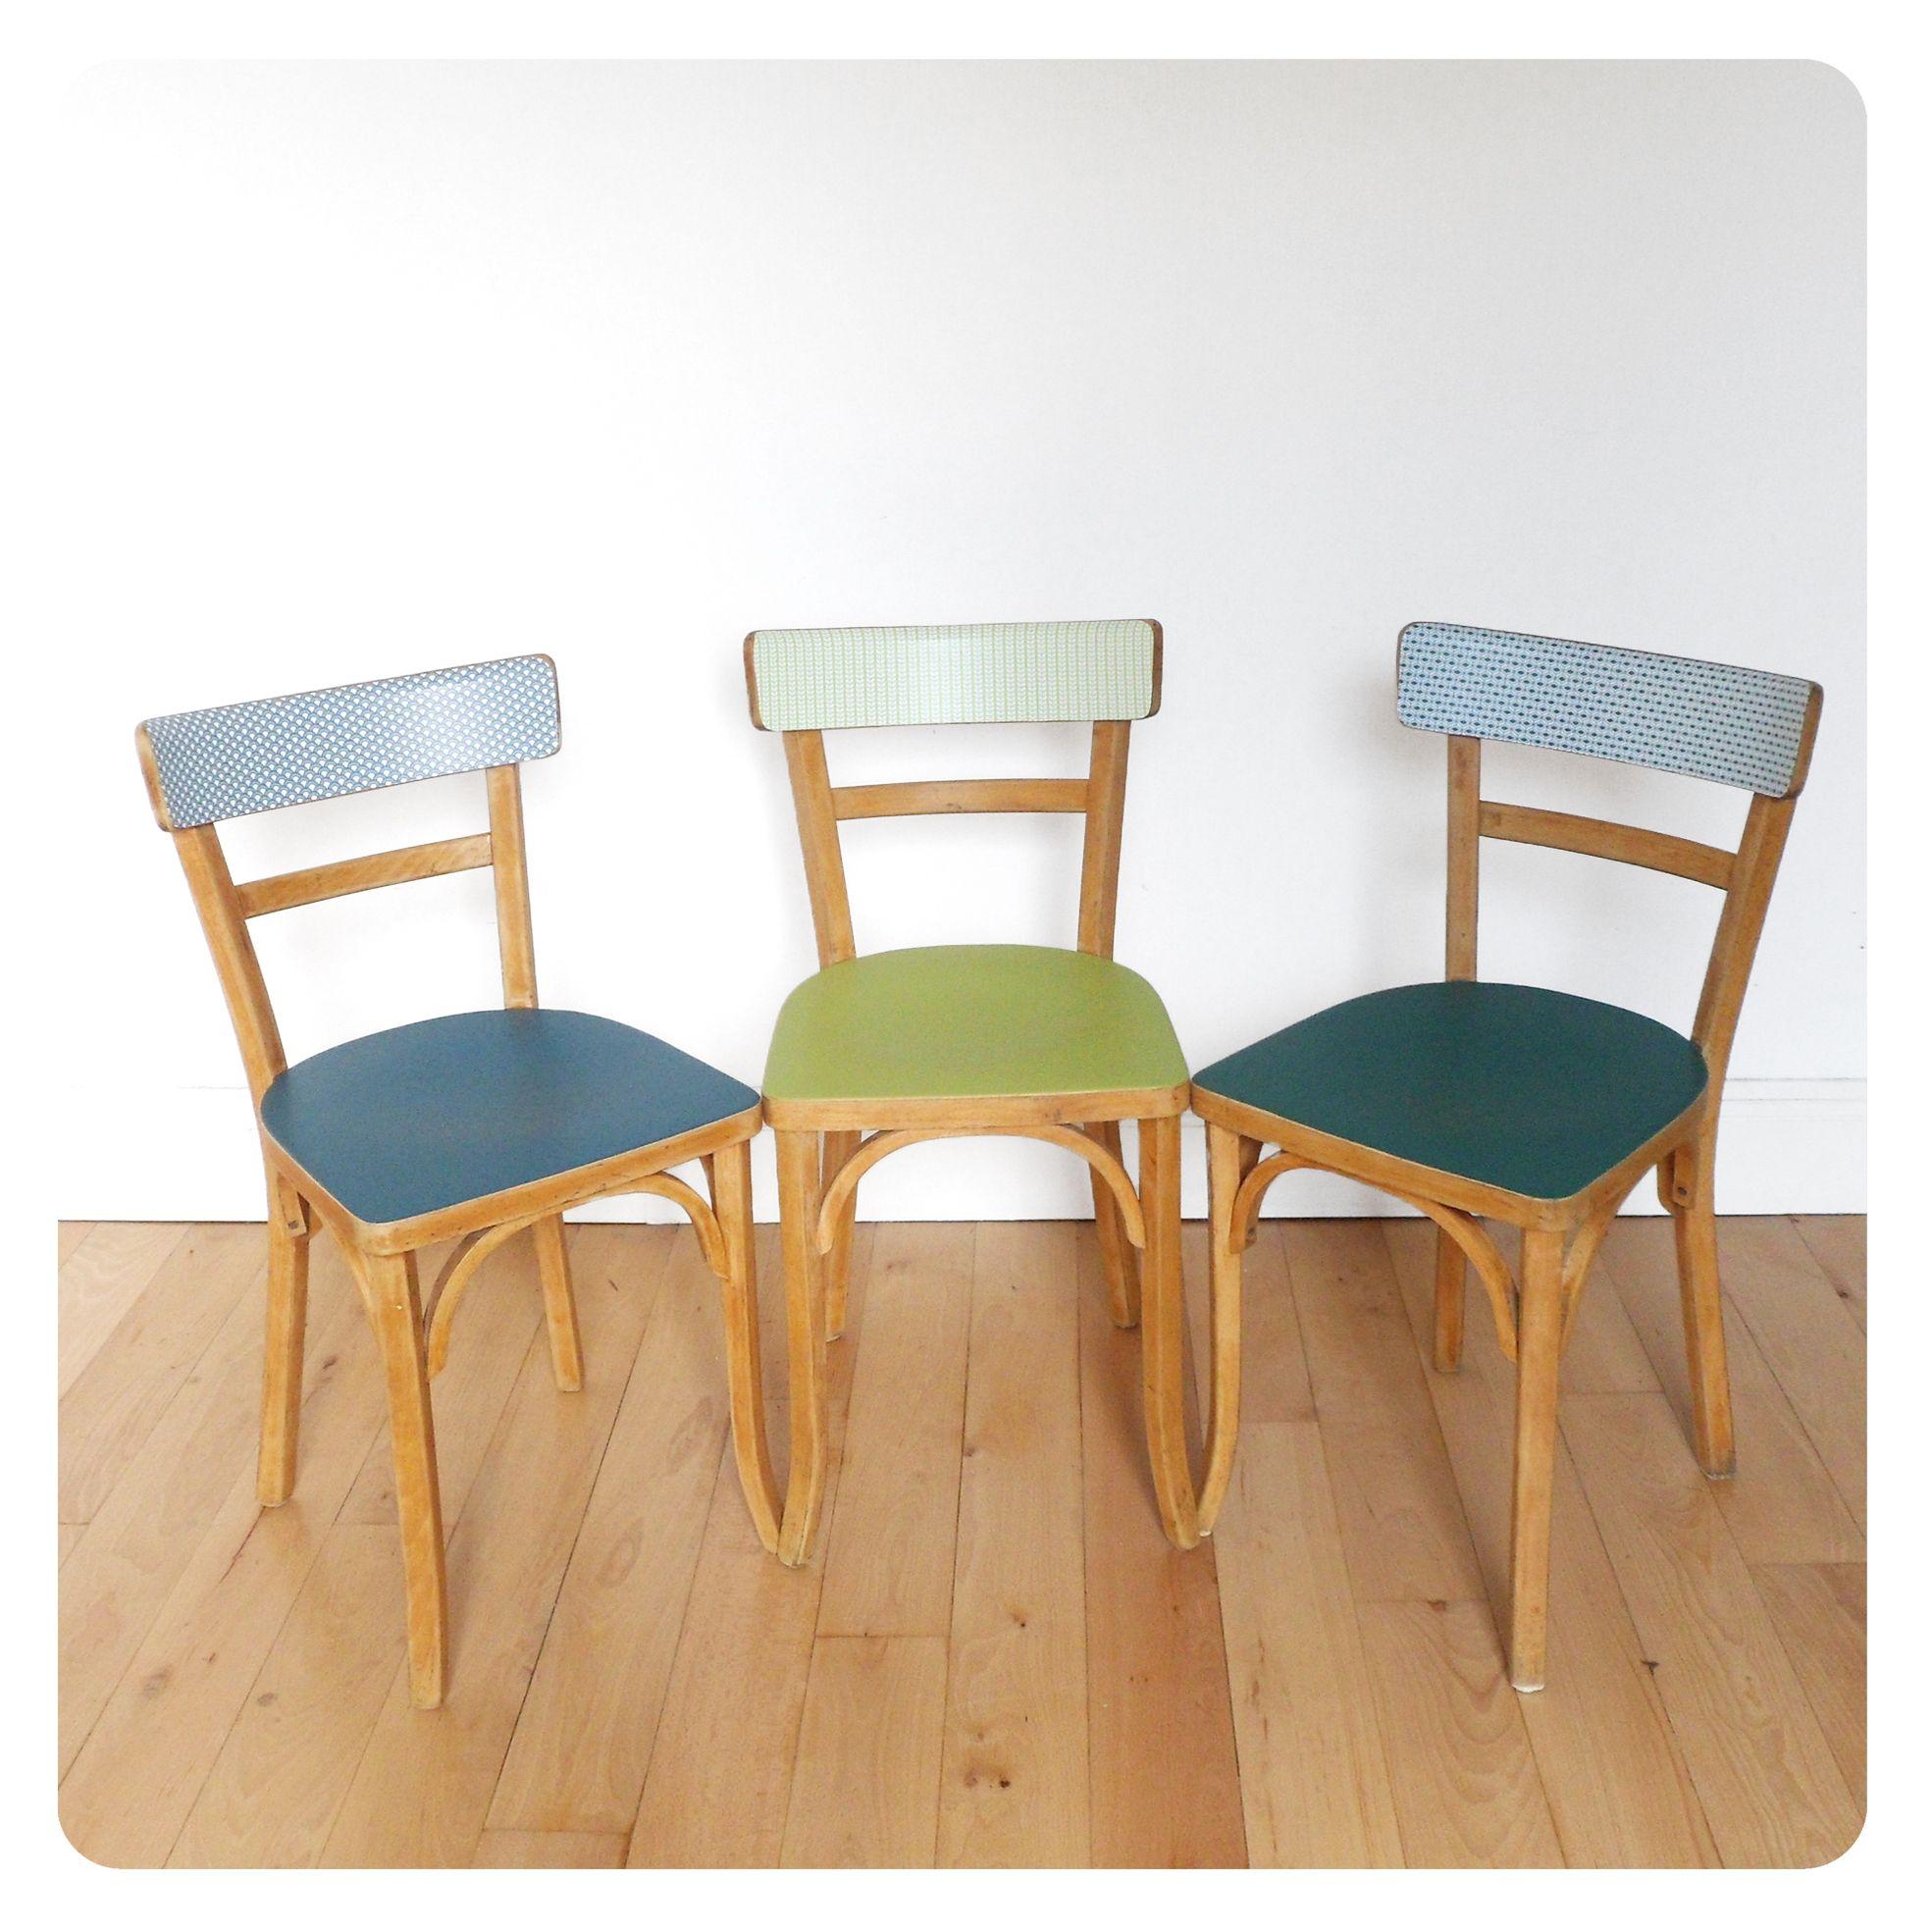 61771a376e2de74d7dcafddecadcb7df Impressionnant De Ensemble Table Chaise Concept